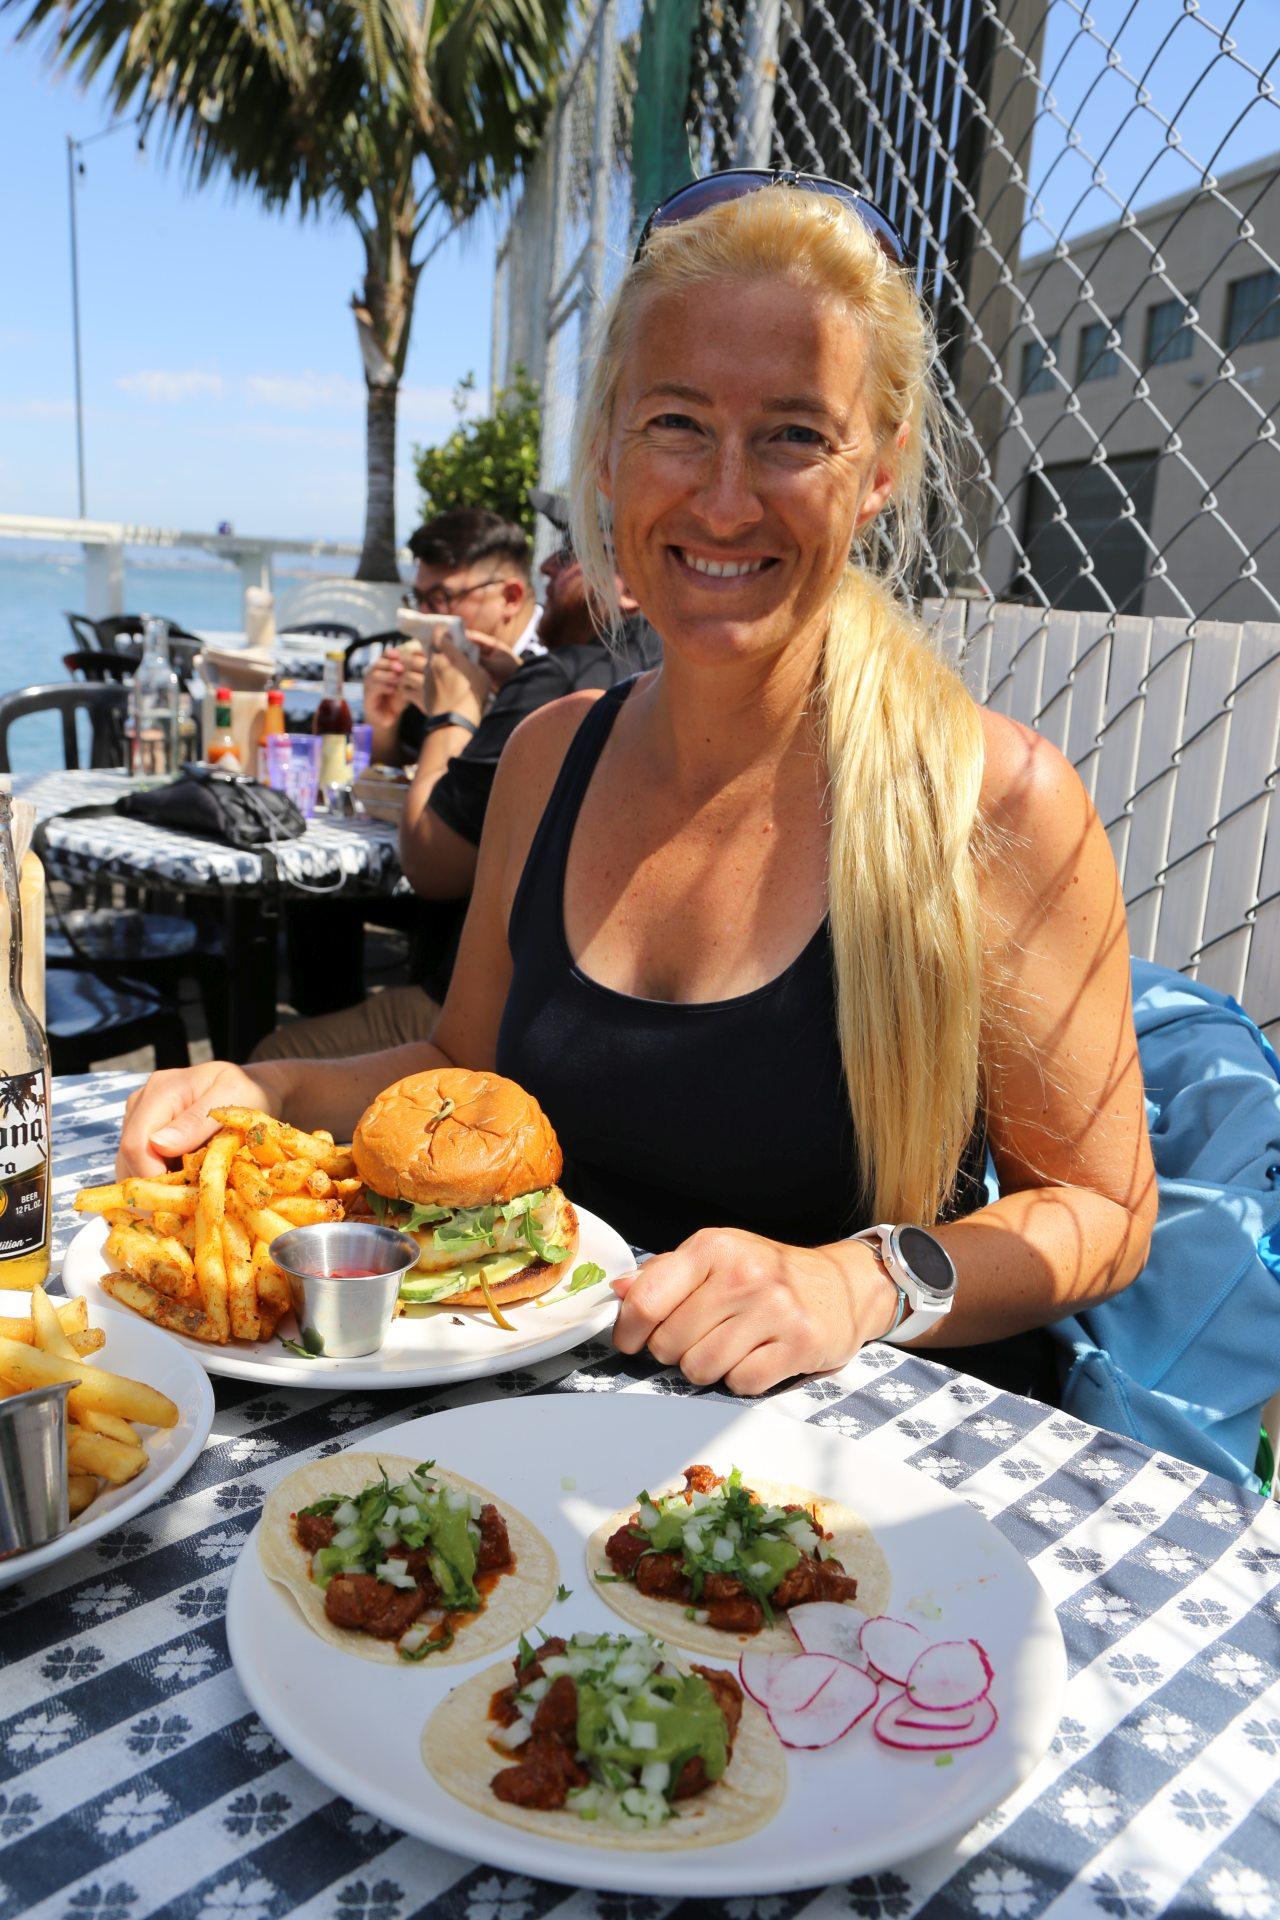 Mittagessen im Pier 23 Resaurant & Bar - Blondine, Burger, Essen, Himmel, Kalifornien, Nahrung, Personen, Portrait, Porträt, San Francisco, Tortilla - HOFBAUER-HOFMANN Sofia - (Telegraph Hill, San Francisco, California, Vereinigte Staaten)